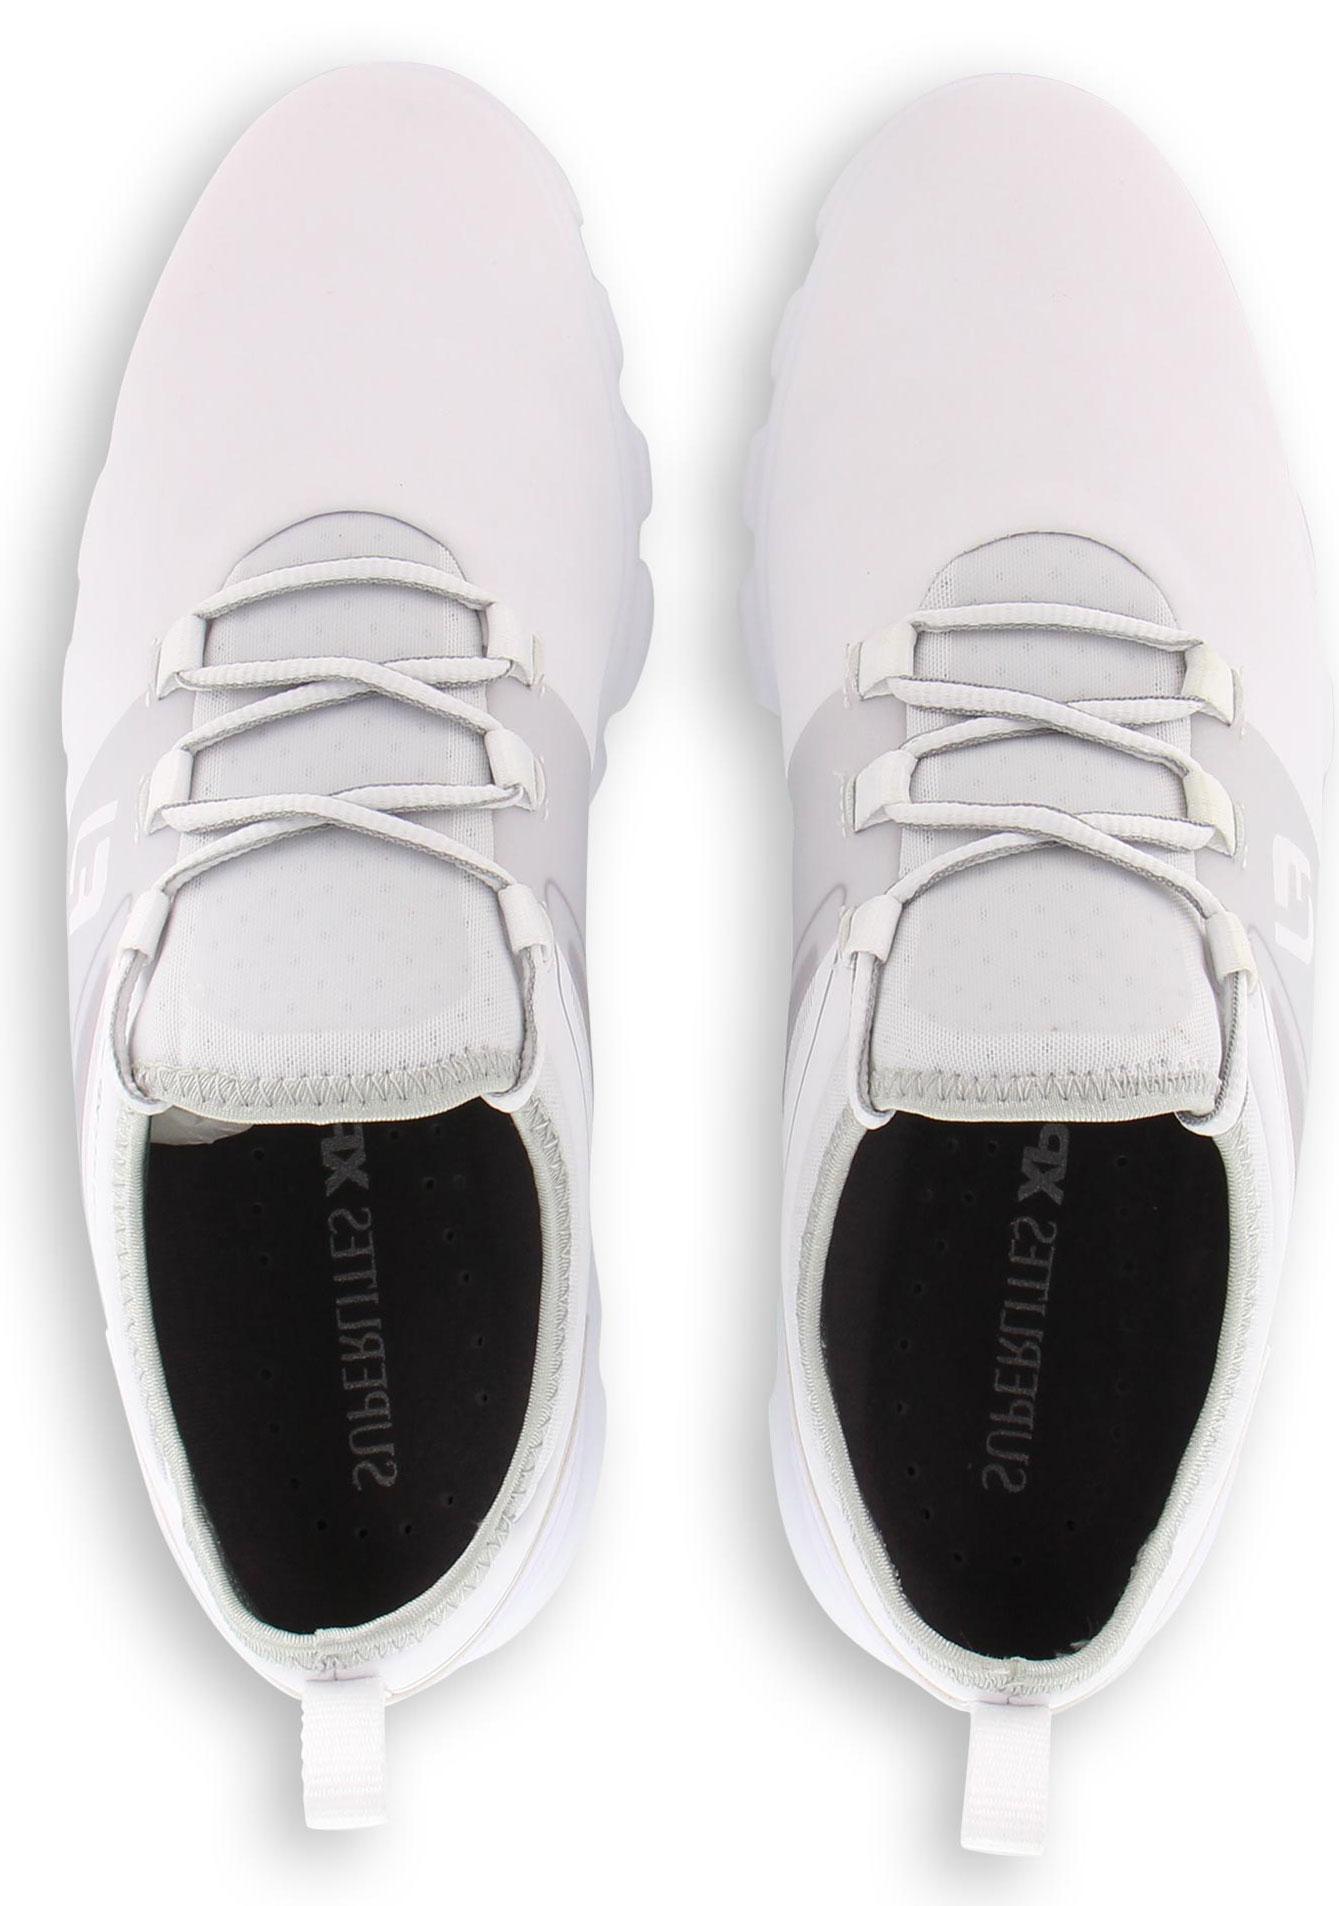 FootJoy-Superlites-XP-Golf-Shoes-Men-039-s-New thumbnail 17